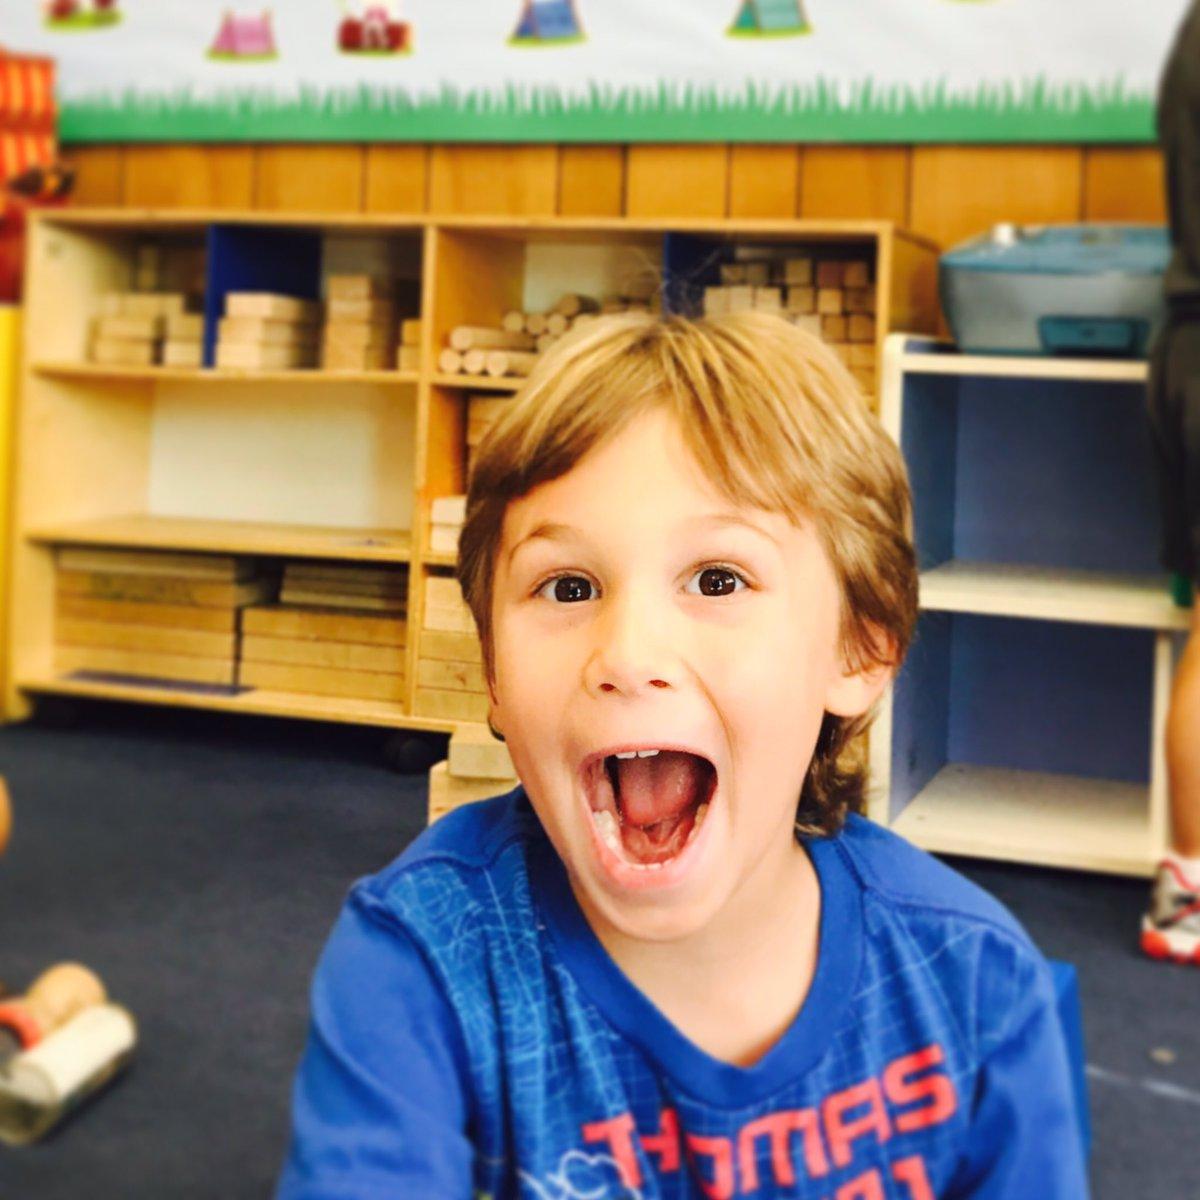 Happy to be at school face! #schooldays #momlife <br>http://pic.twitter.com/Kroq1XFqyn